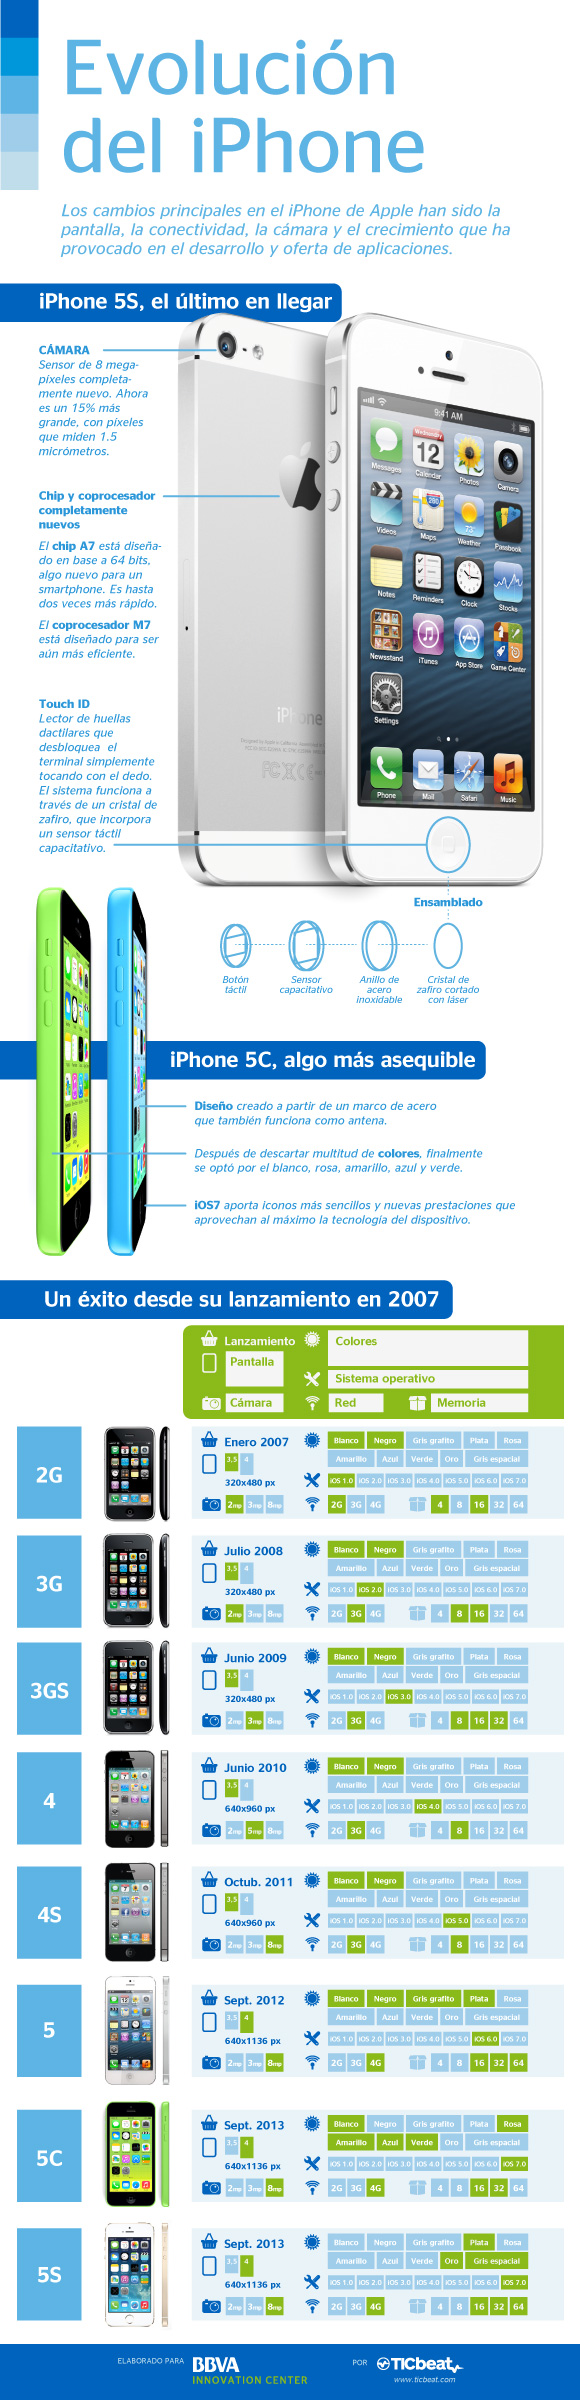 bbva-iphone